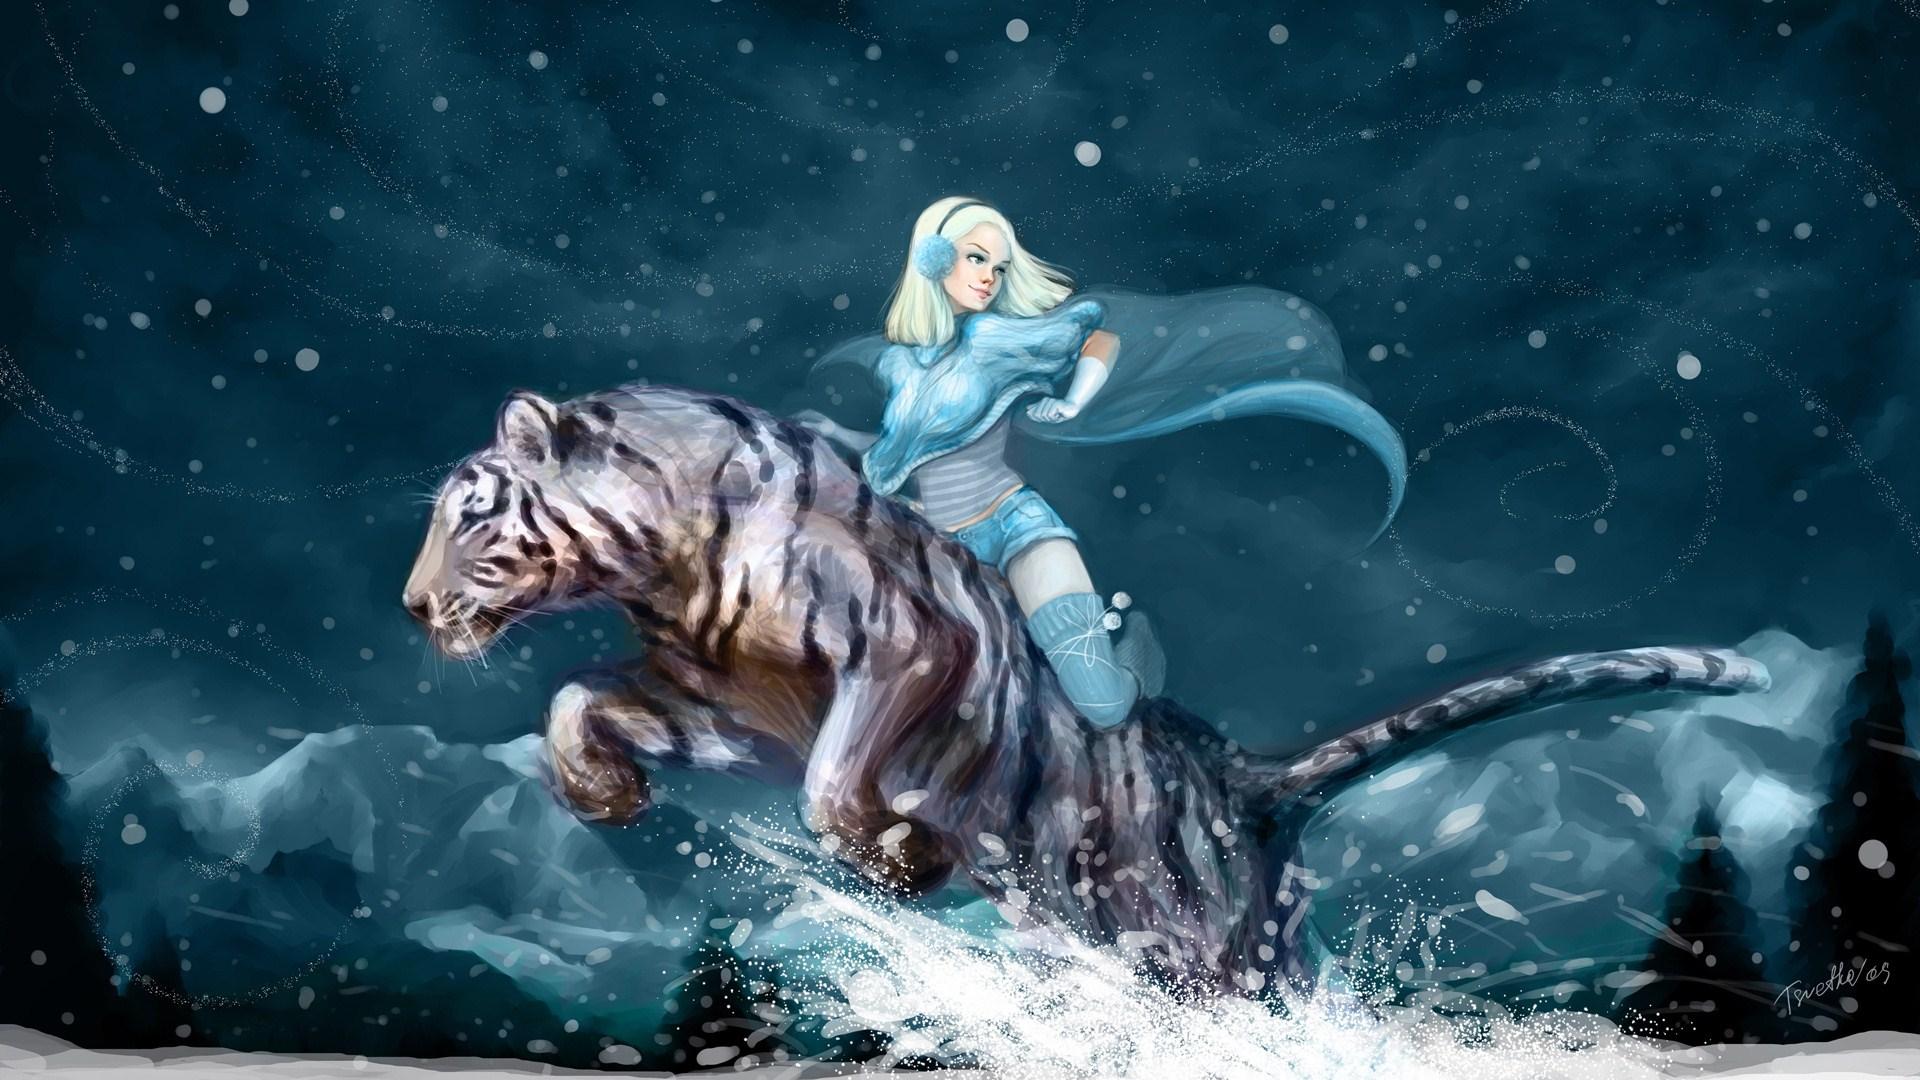 image   anime girl white tiger winter snow mountains night